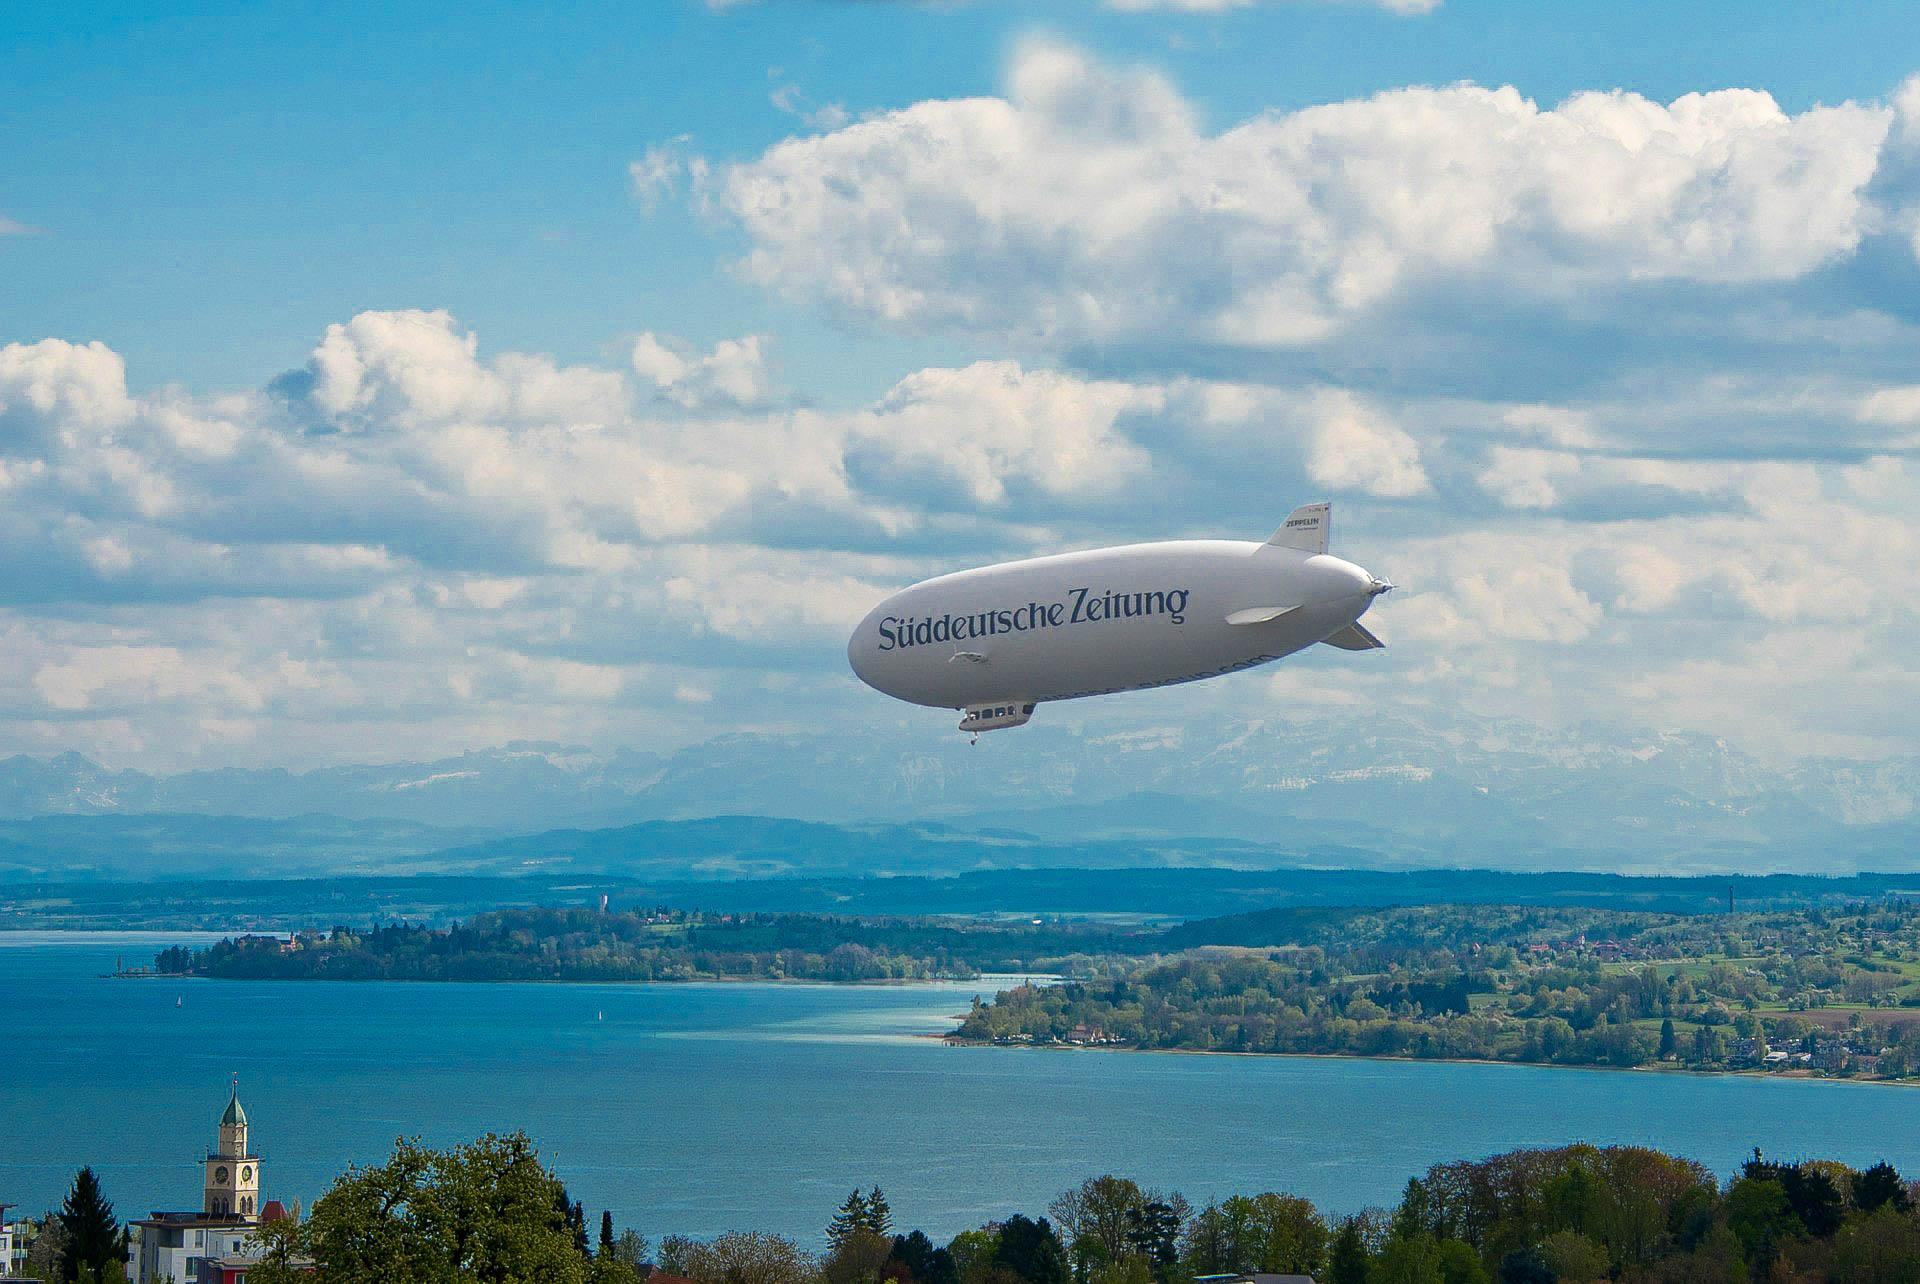 Німеччина Боденське озеро дирижабль